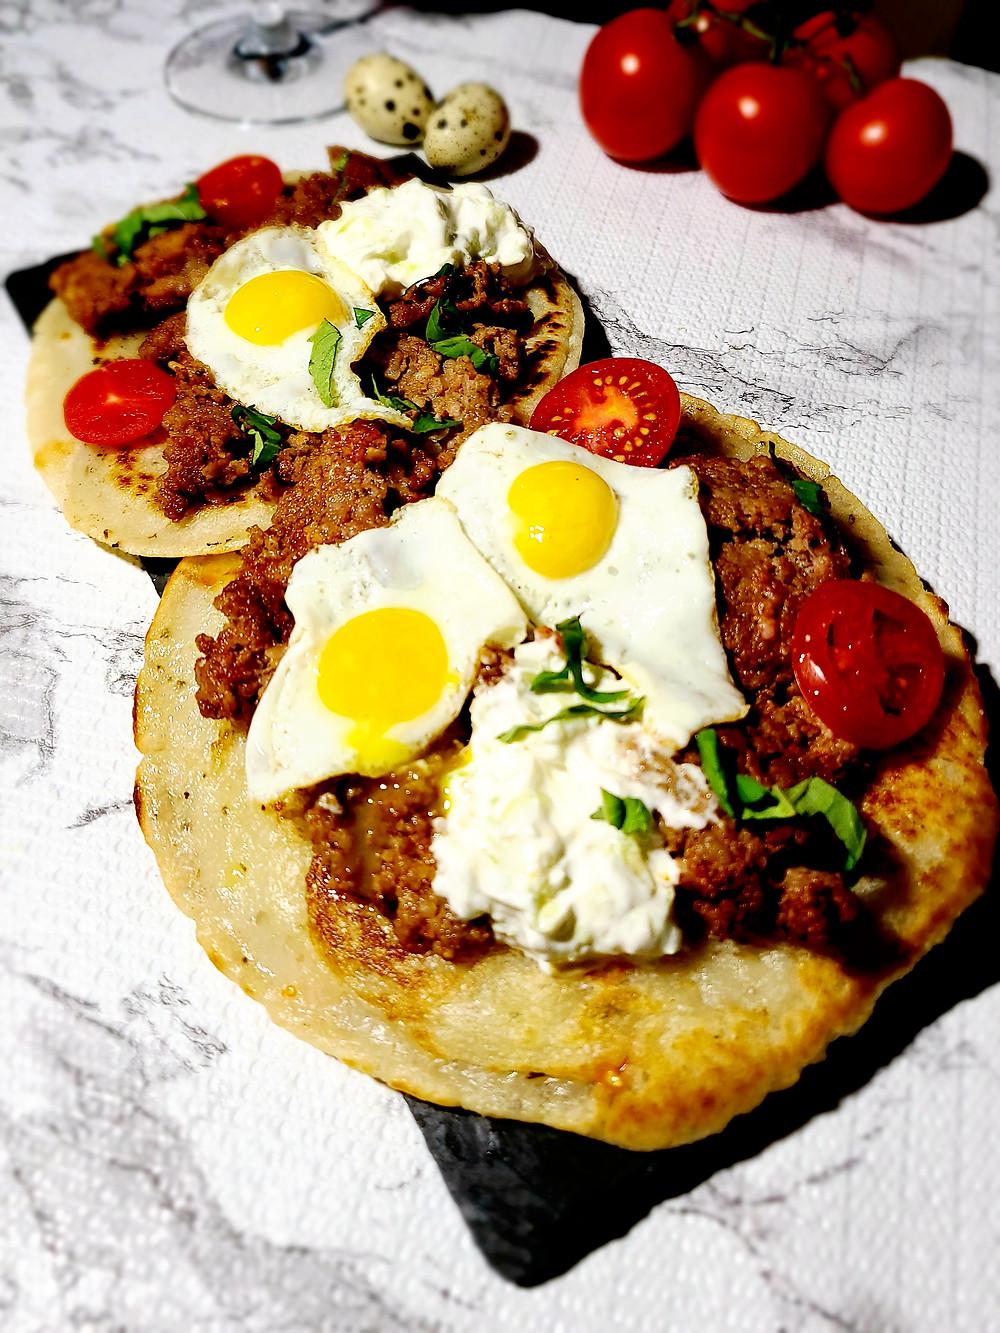 4-Ingredient Mock-Pita Pan-Bread (Gluten-free, Soy-free, Grain-free)